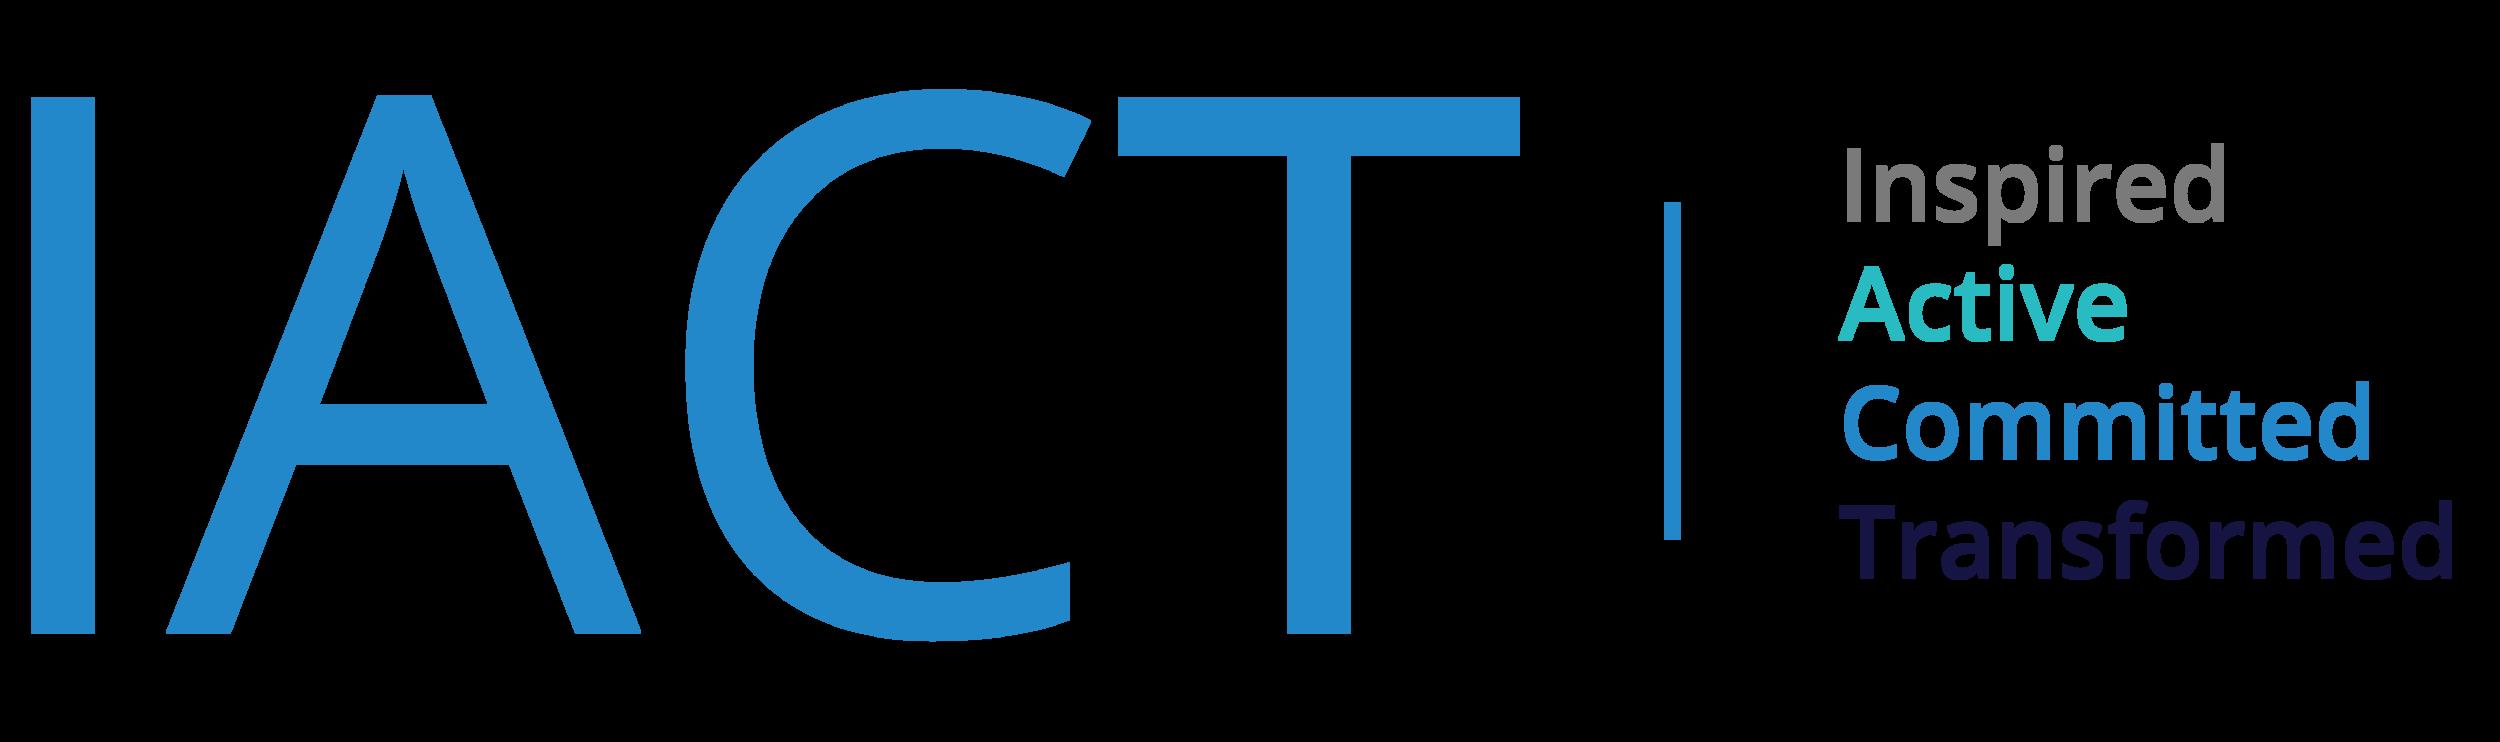 IACT_logo-2.png